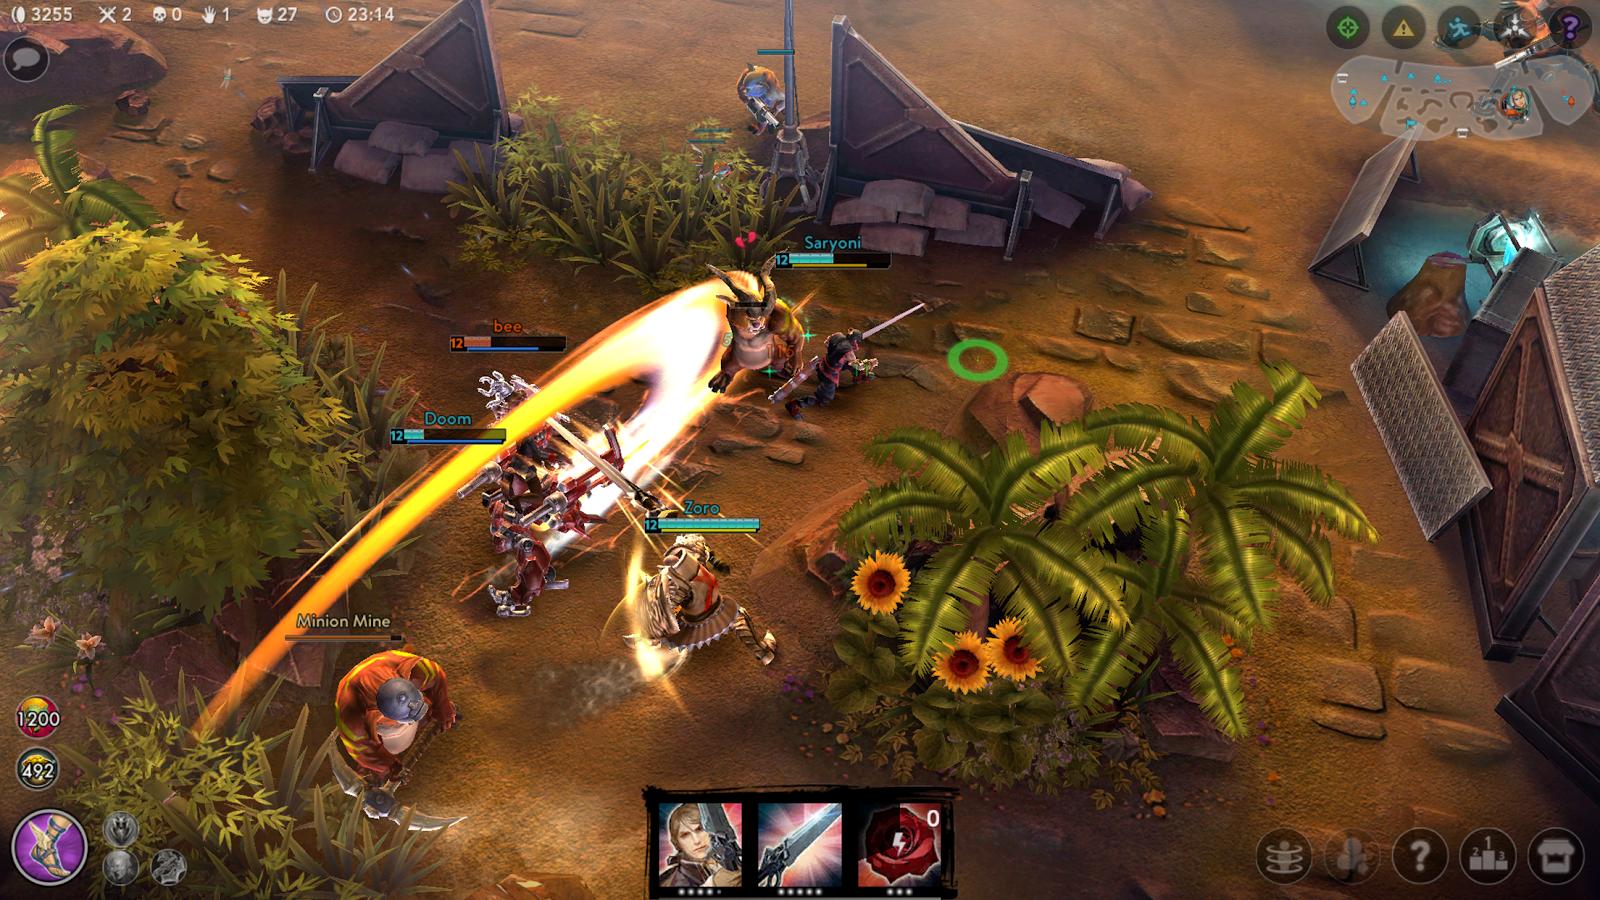 Heroes of order and chaos онлайн игра похожая на dota.